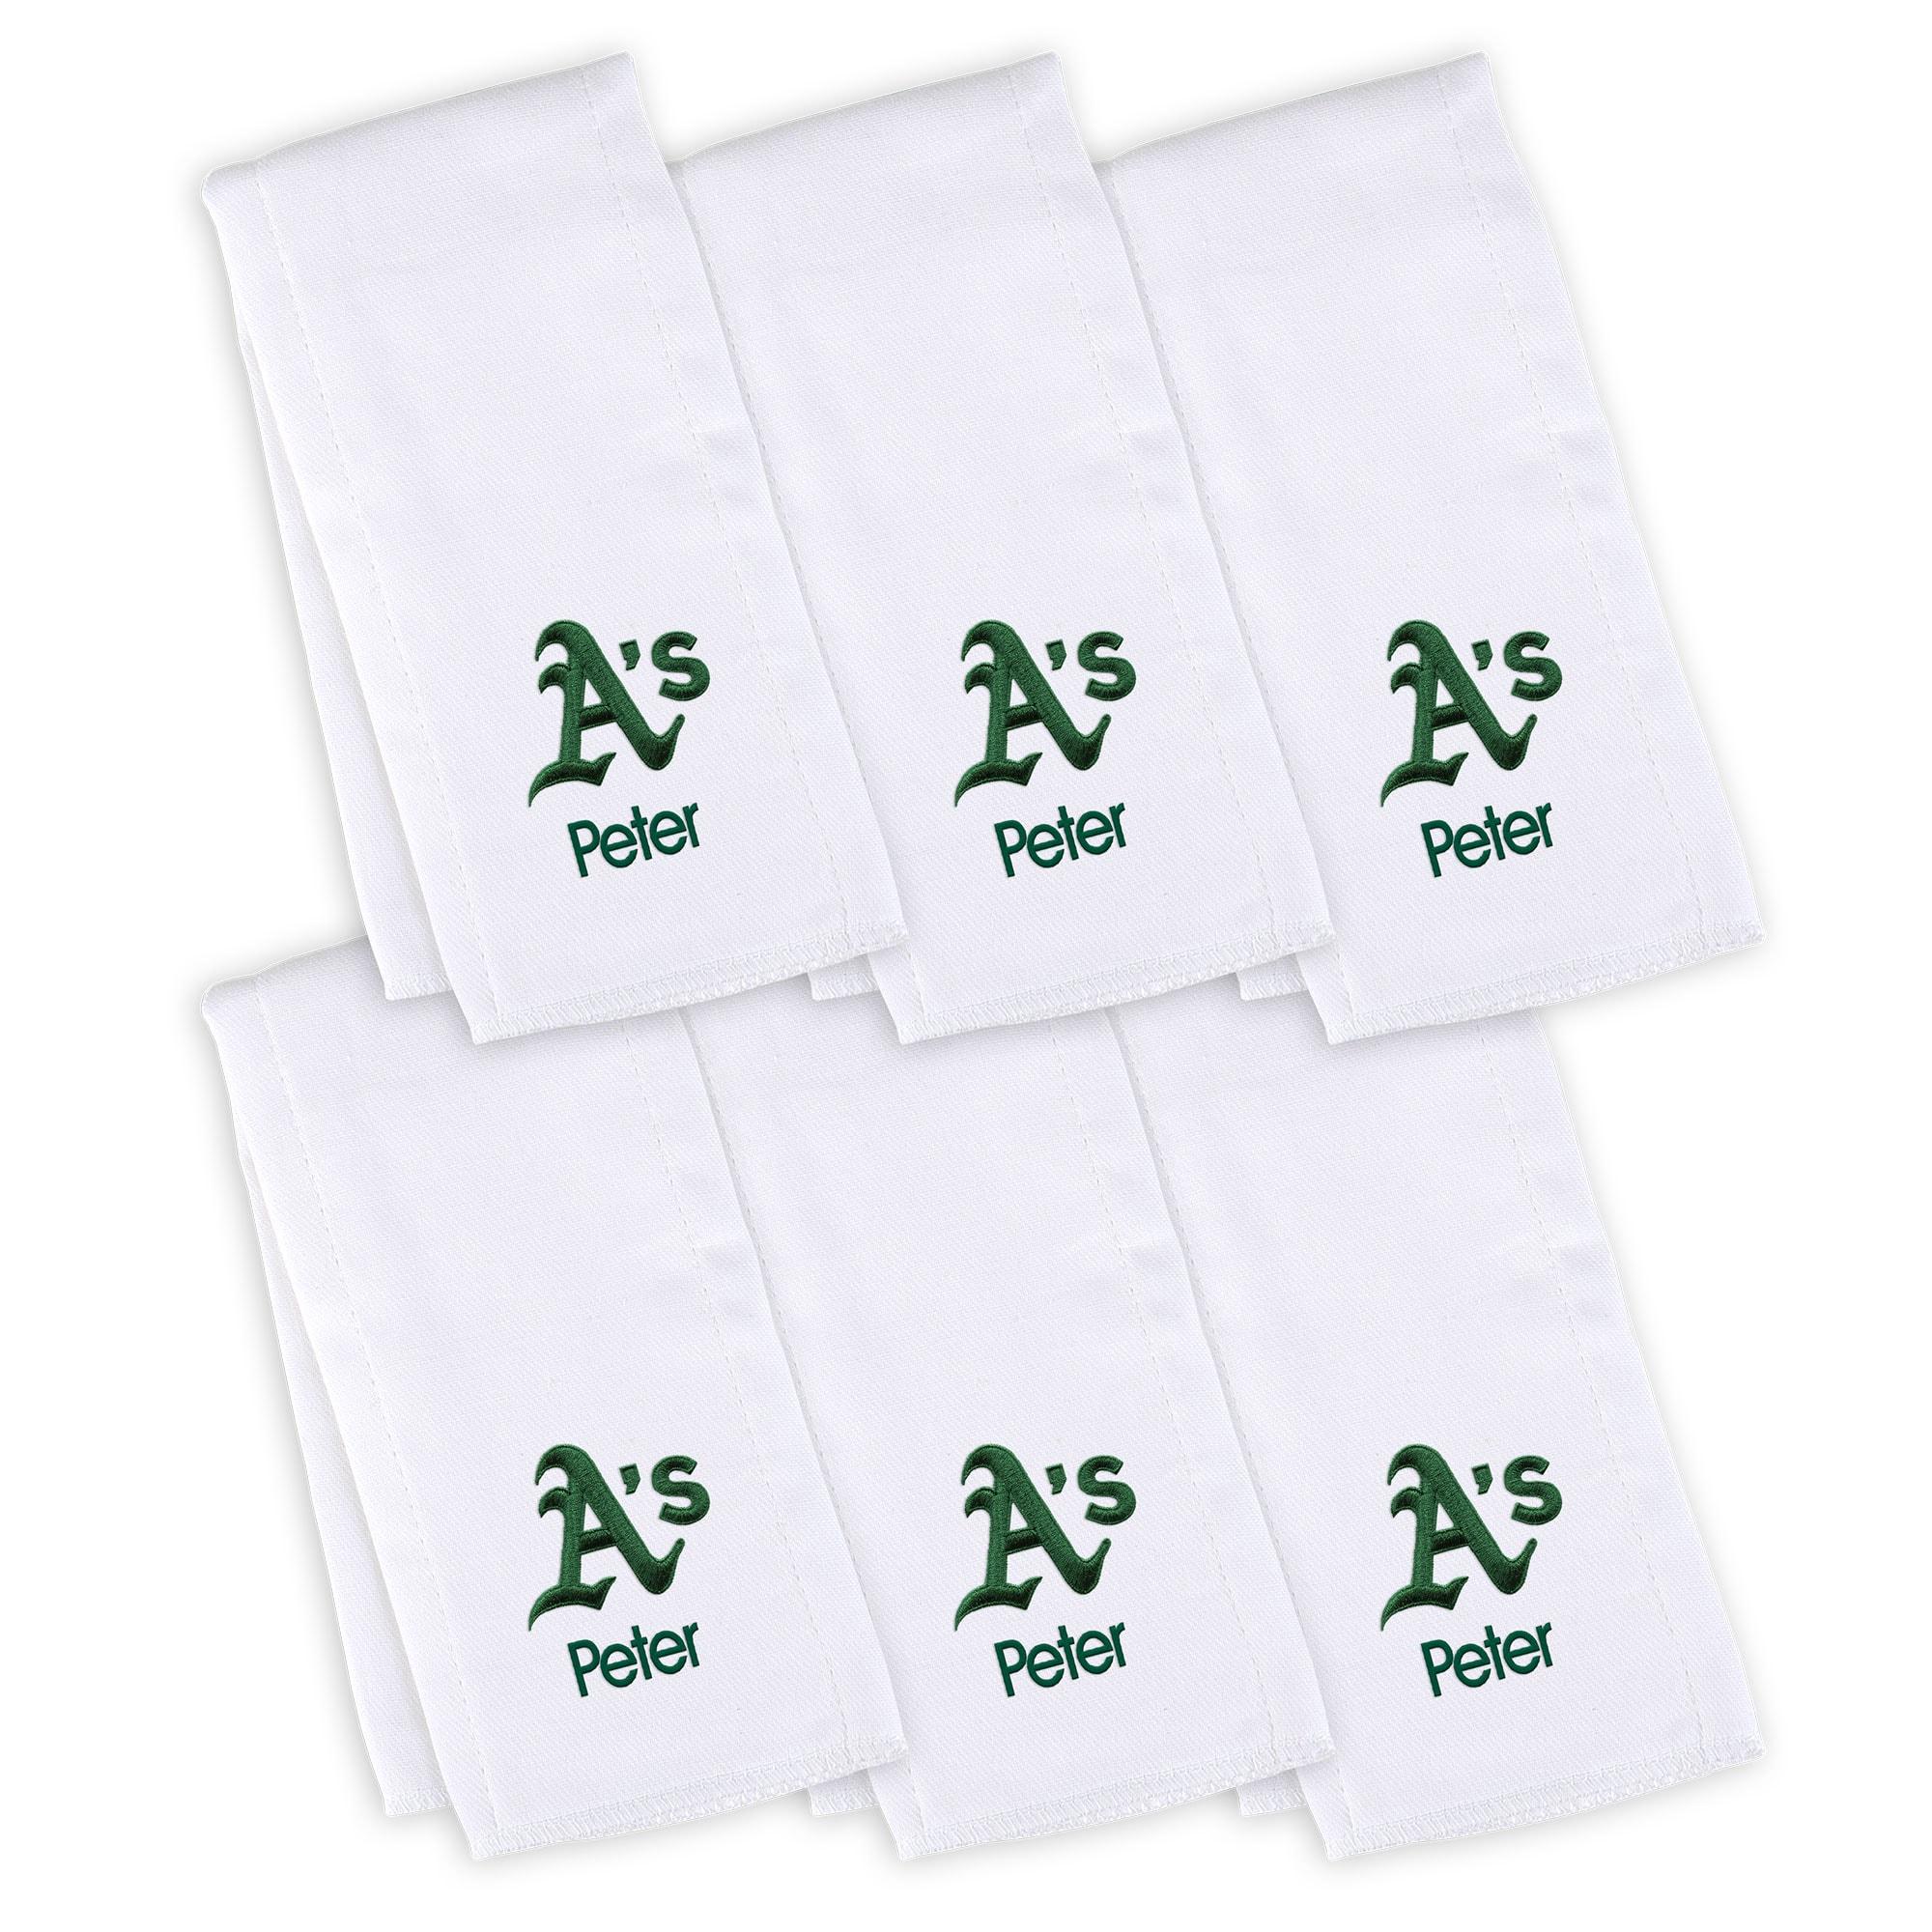 Oakland Athletics Infant Personalized Burp Cloth 6-Pack - White